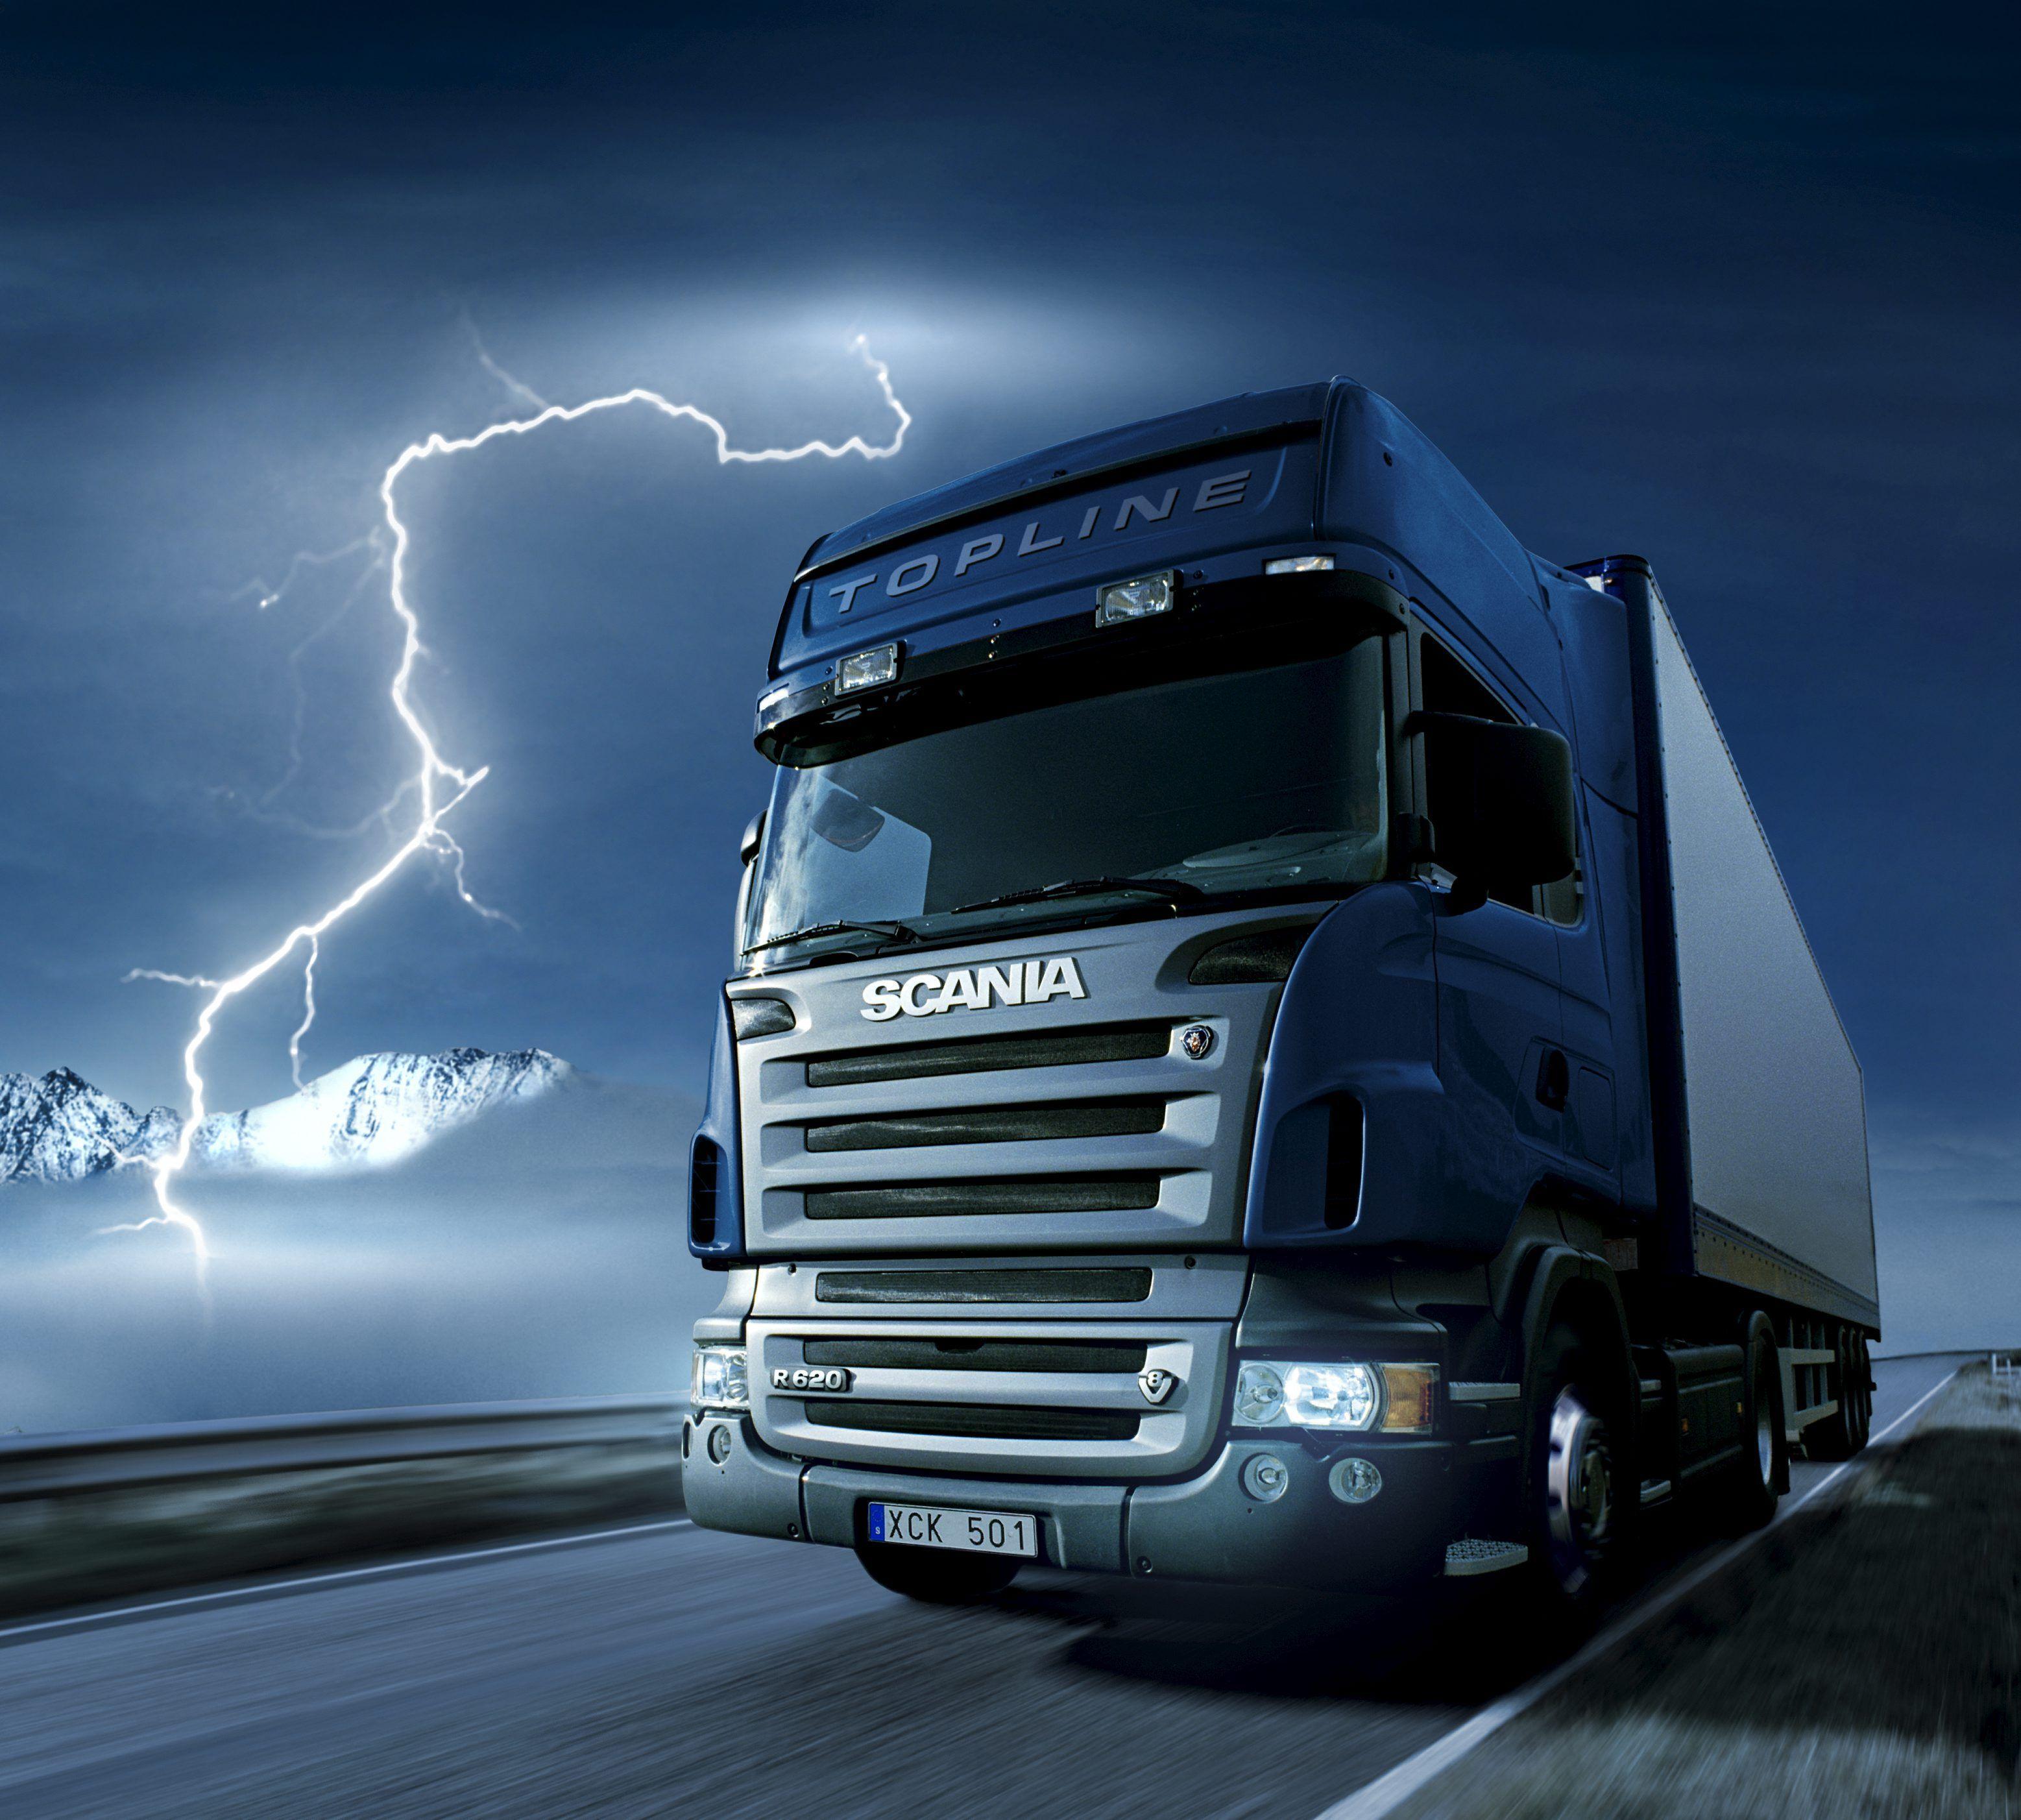 15 Best Trucks In The World Cool Trucks Pictures Volvo Trucks Scania Truck Truck Wallpaper